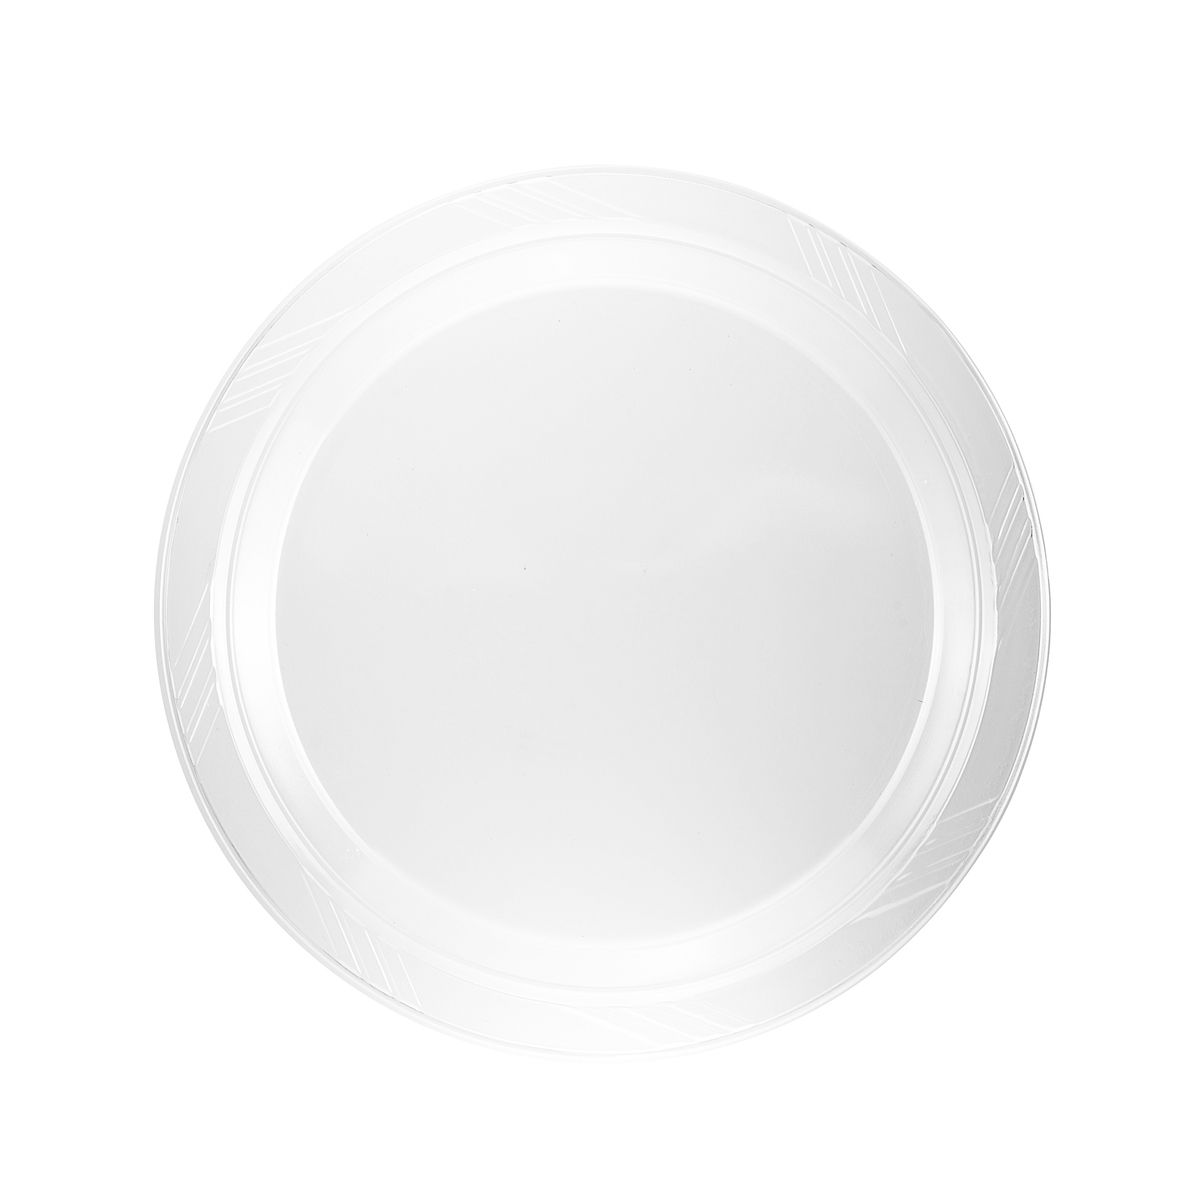 ... Plastico 6  Plates - Clear Plastic - 40 Count  sc 1 st  Fantastic Inc & Plastico 6